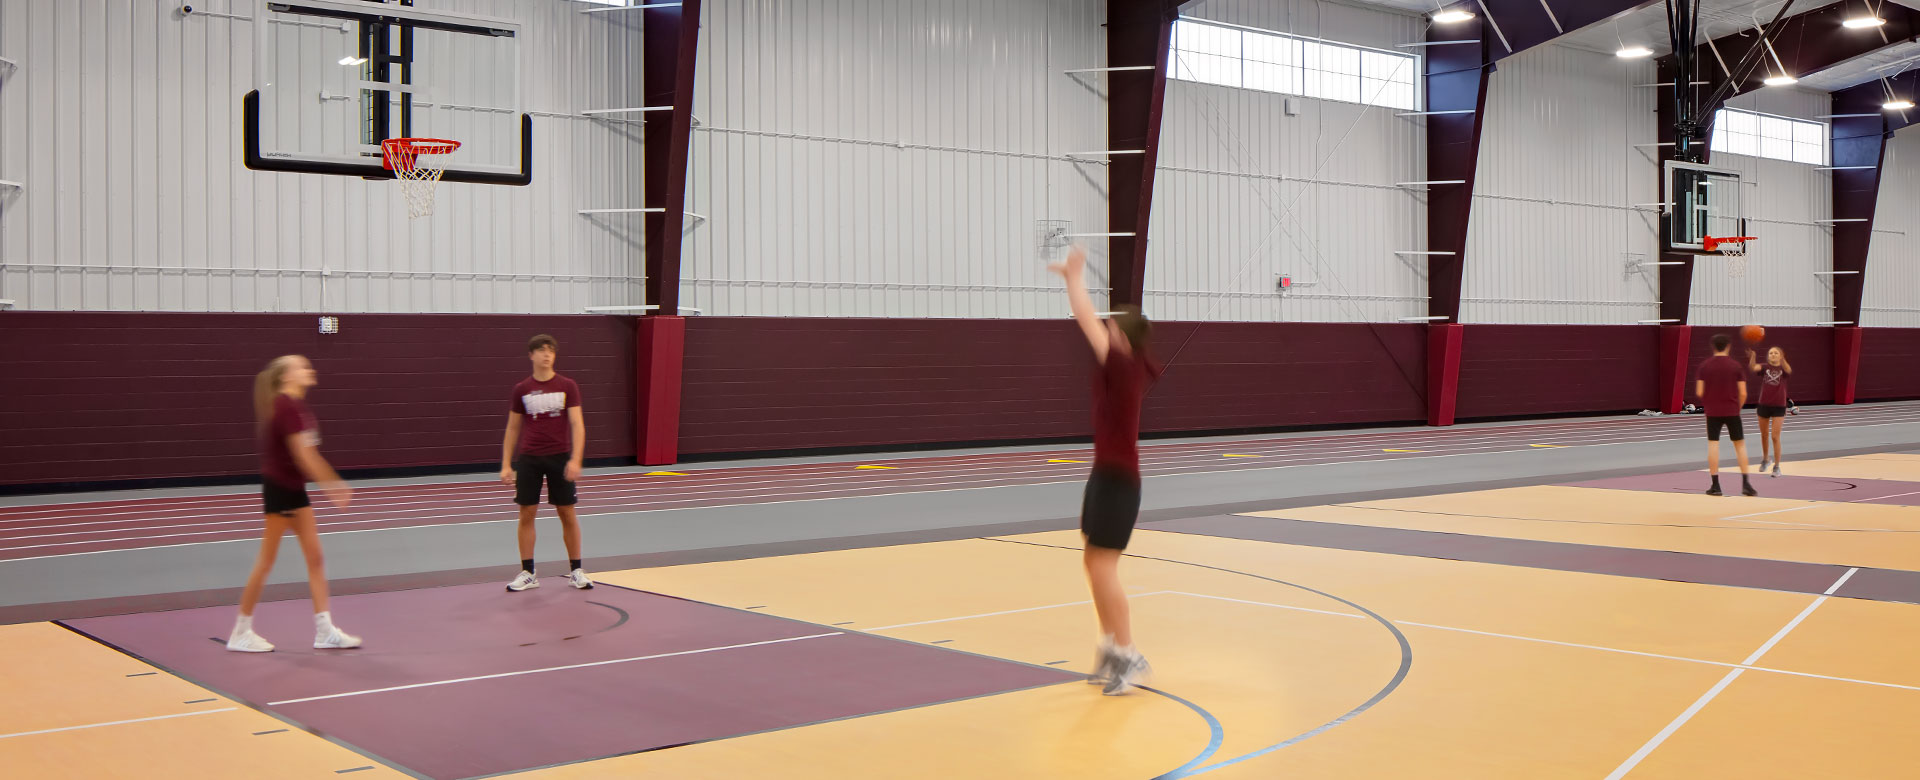 Moline High School Physical Education Facility